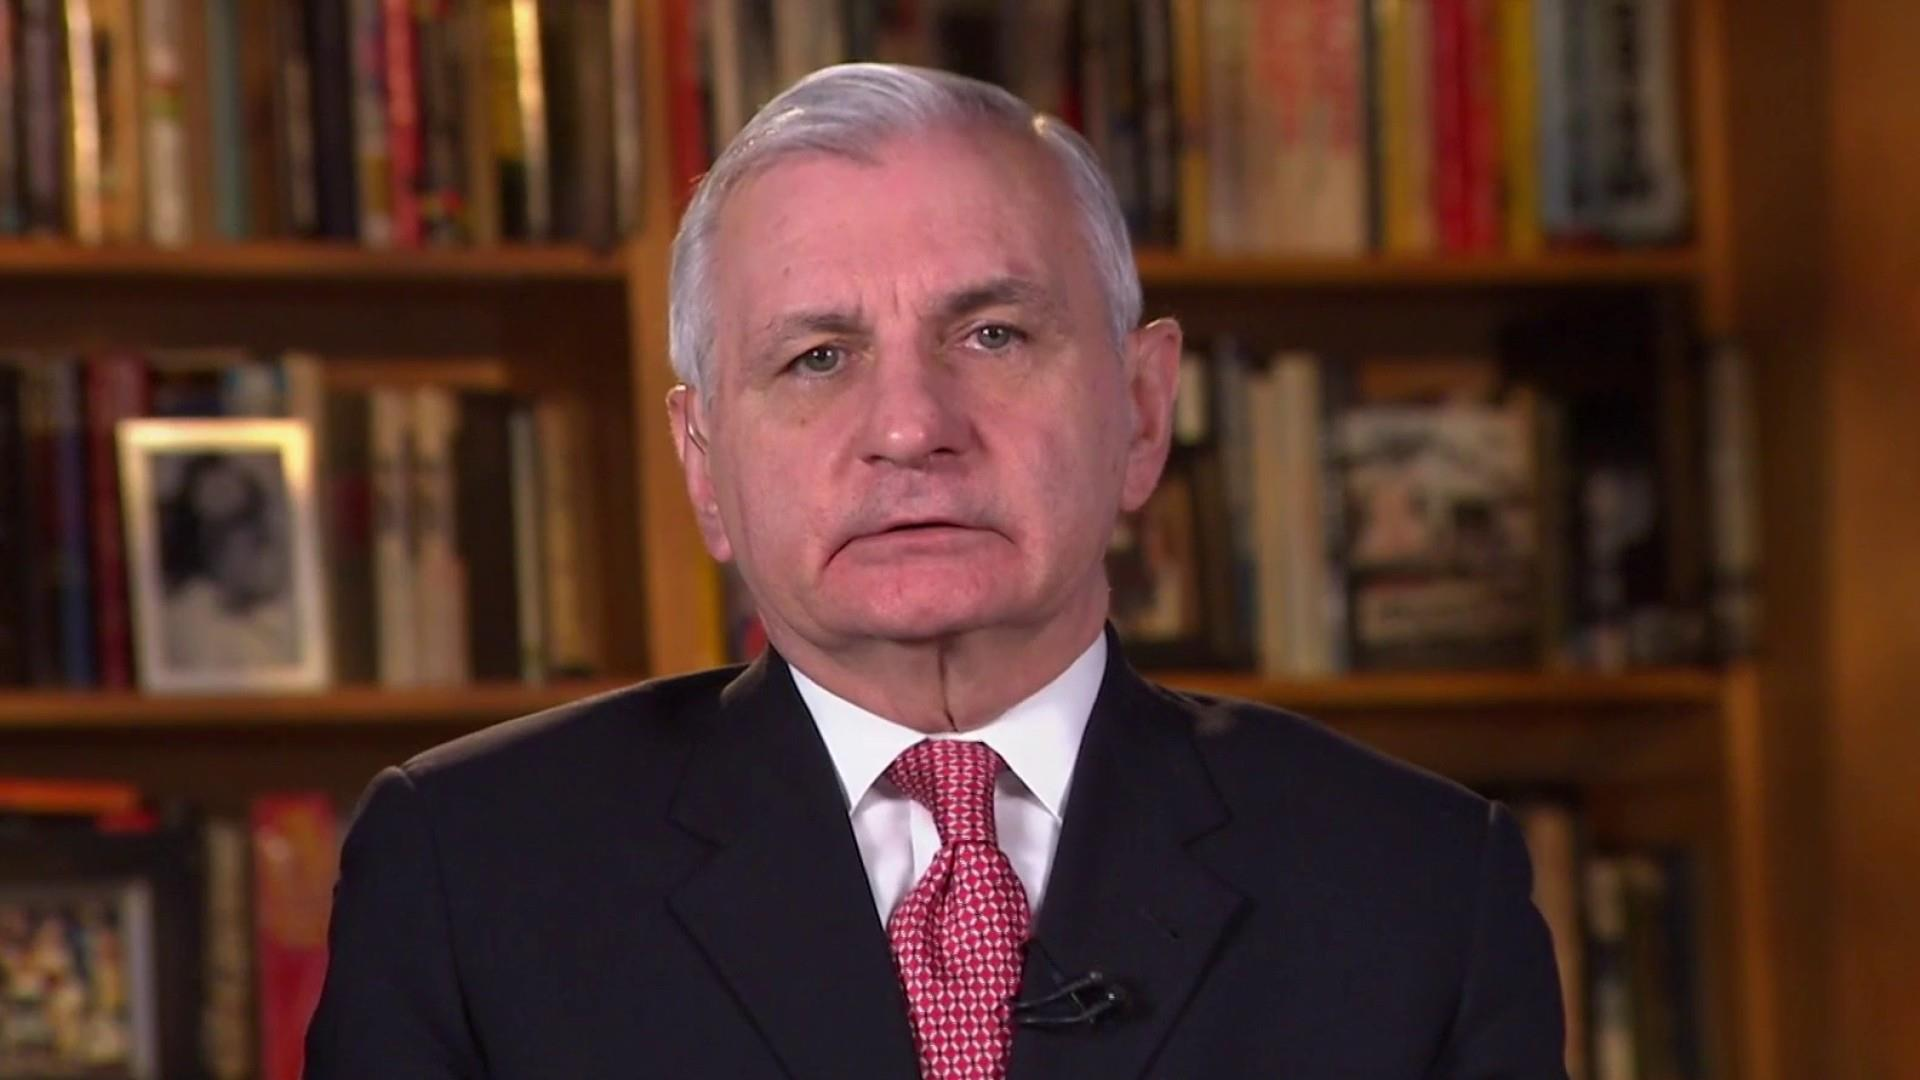 Sen. Reed: Trump's attacks on John McCain 'despicable'